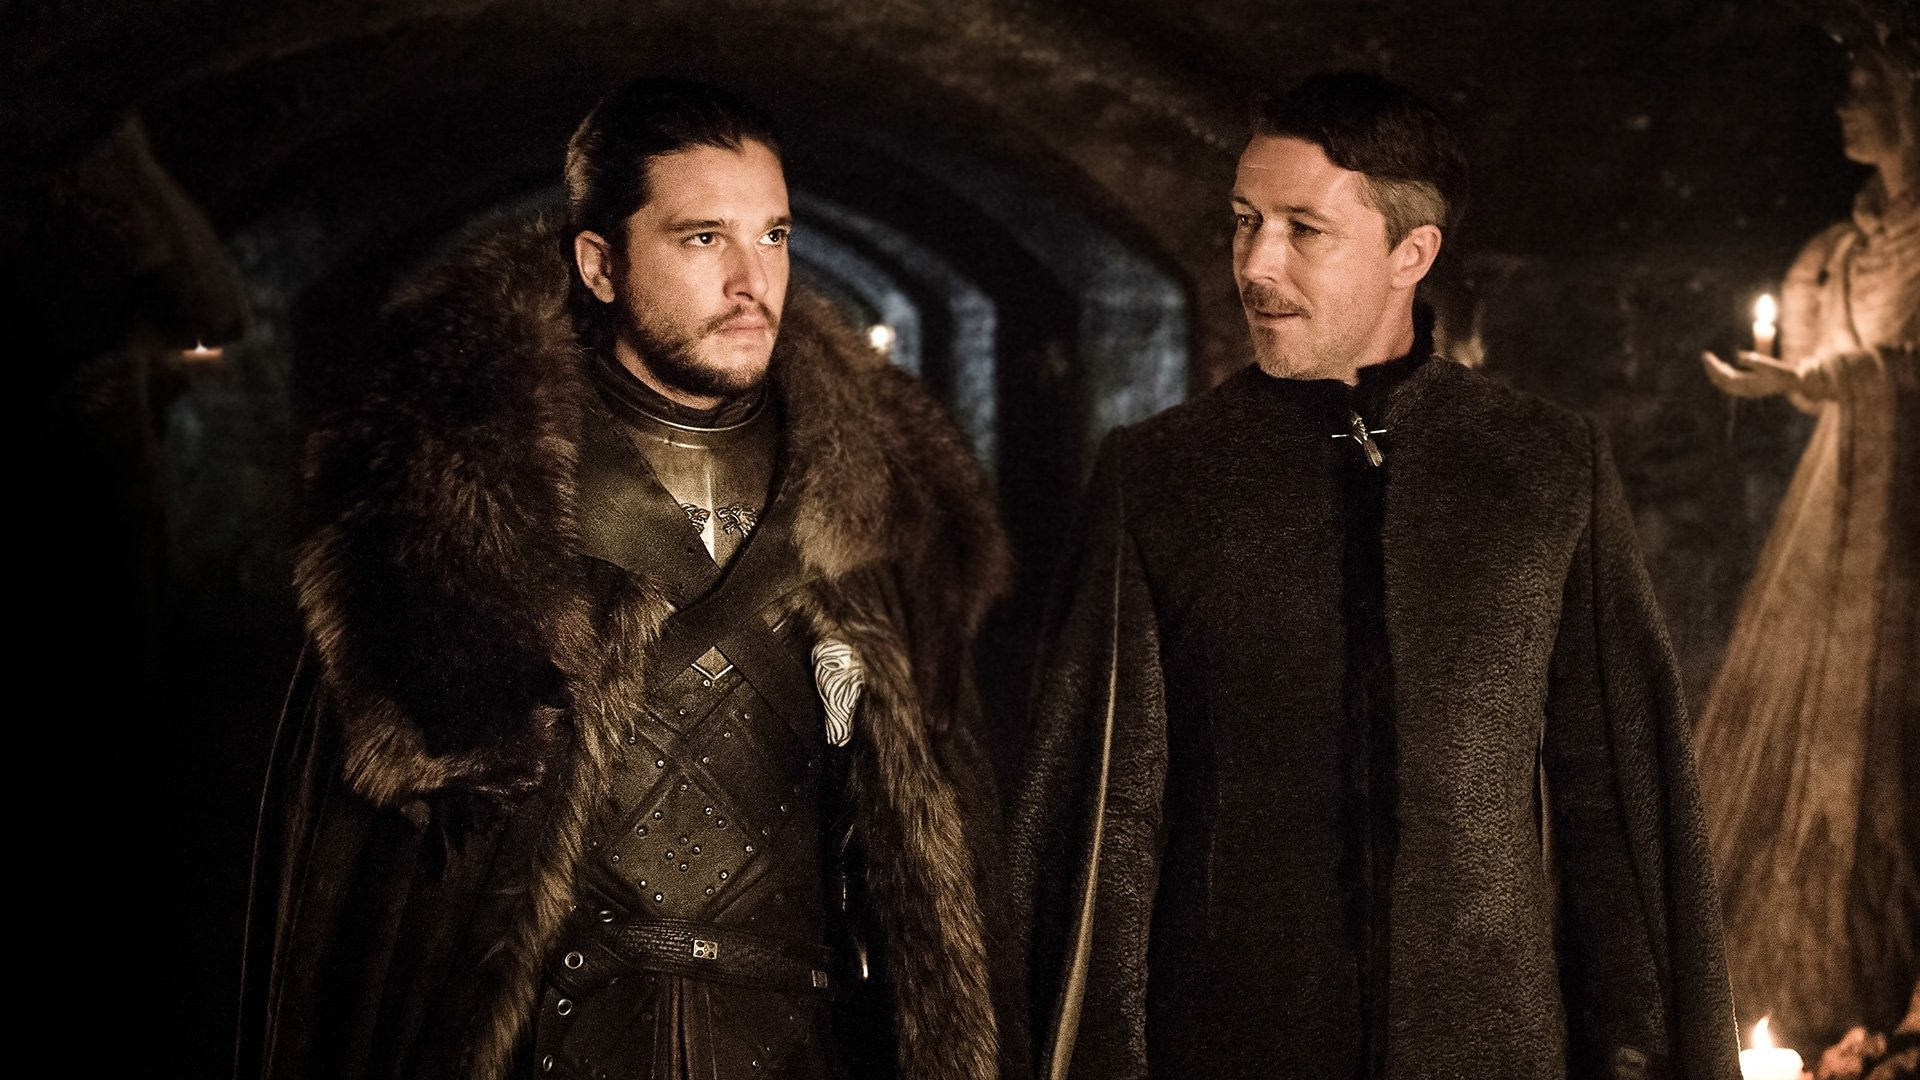 Game of Thrones - Stormborn